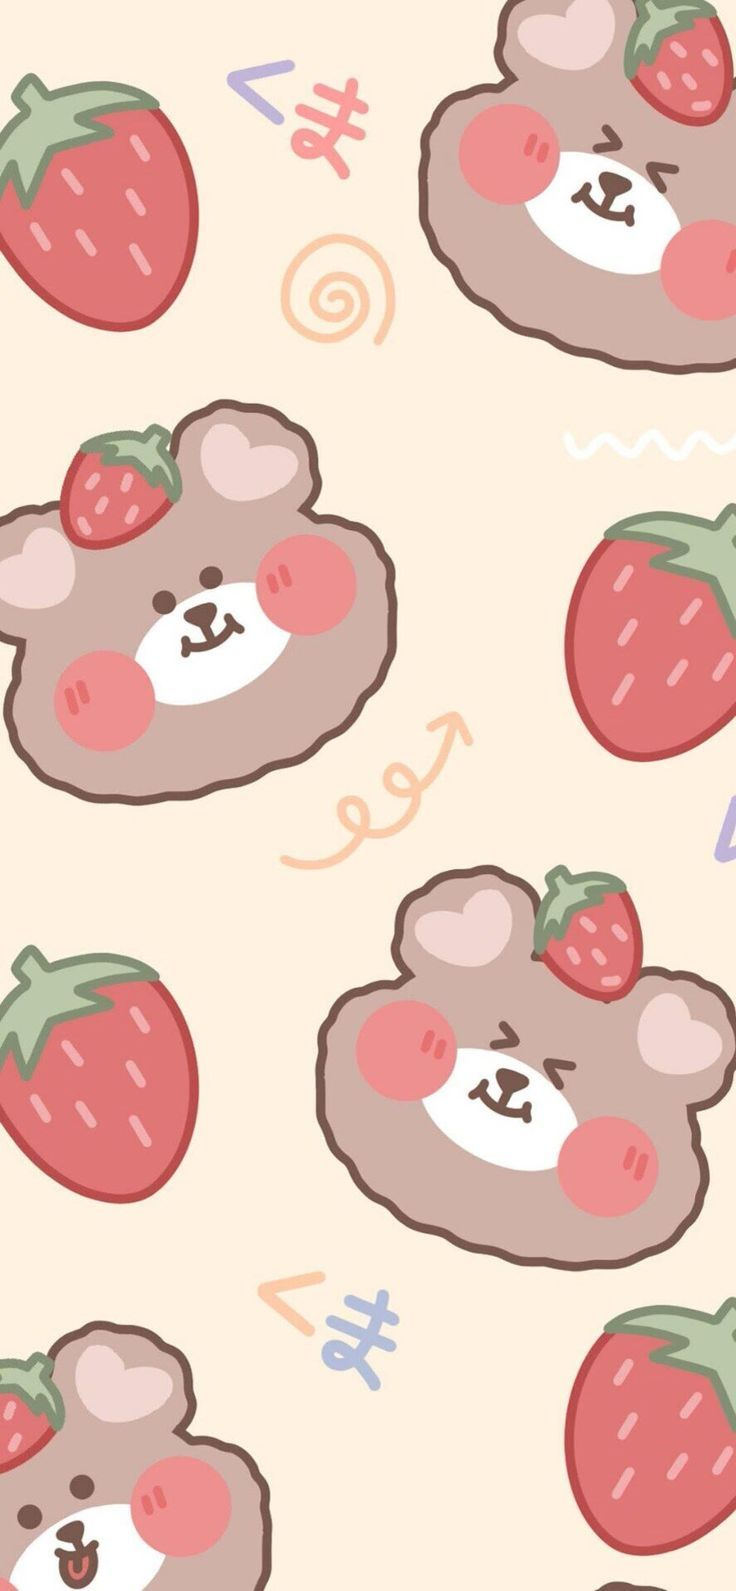 Images By Mokkeri On Wallpaper | Wallpaper Iphone Cute, Cute Wallpapers, Cute Cartoon Wallpapers F46